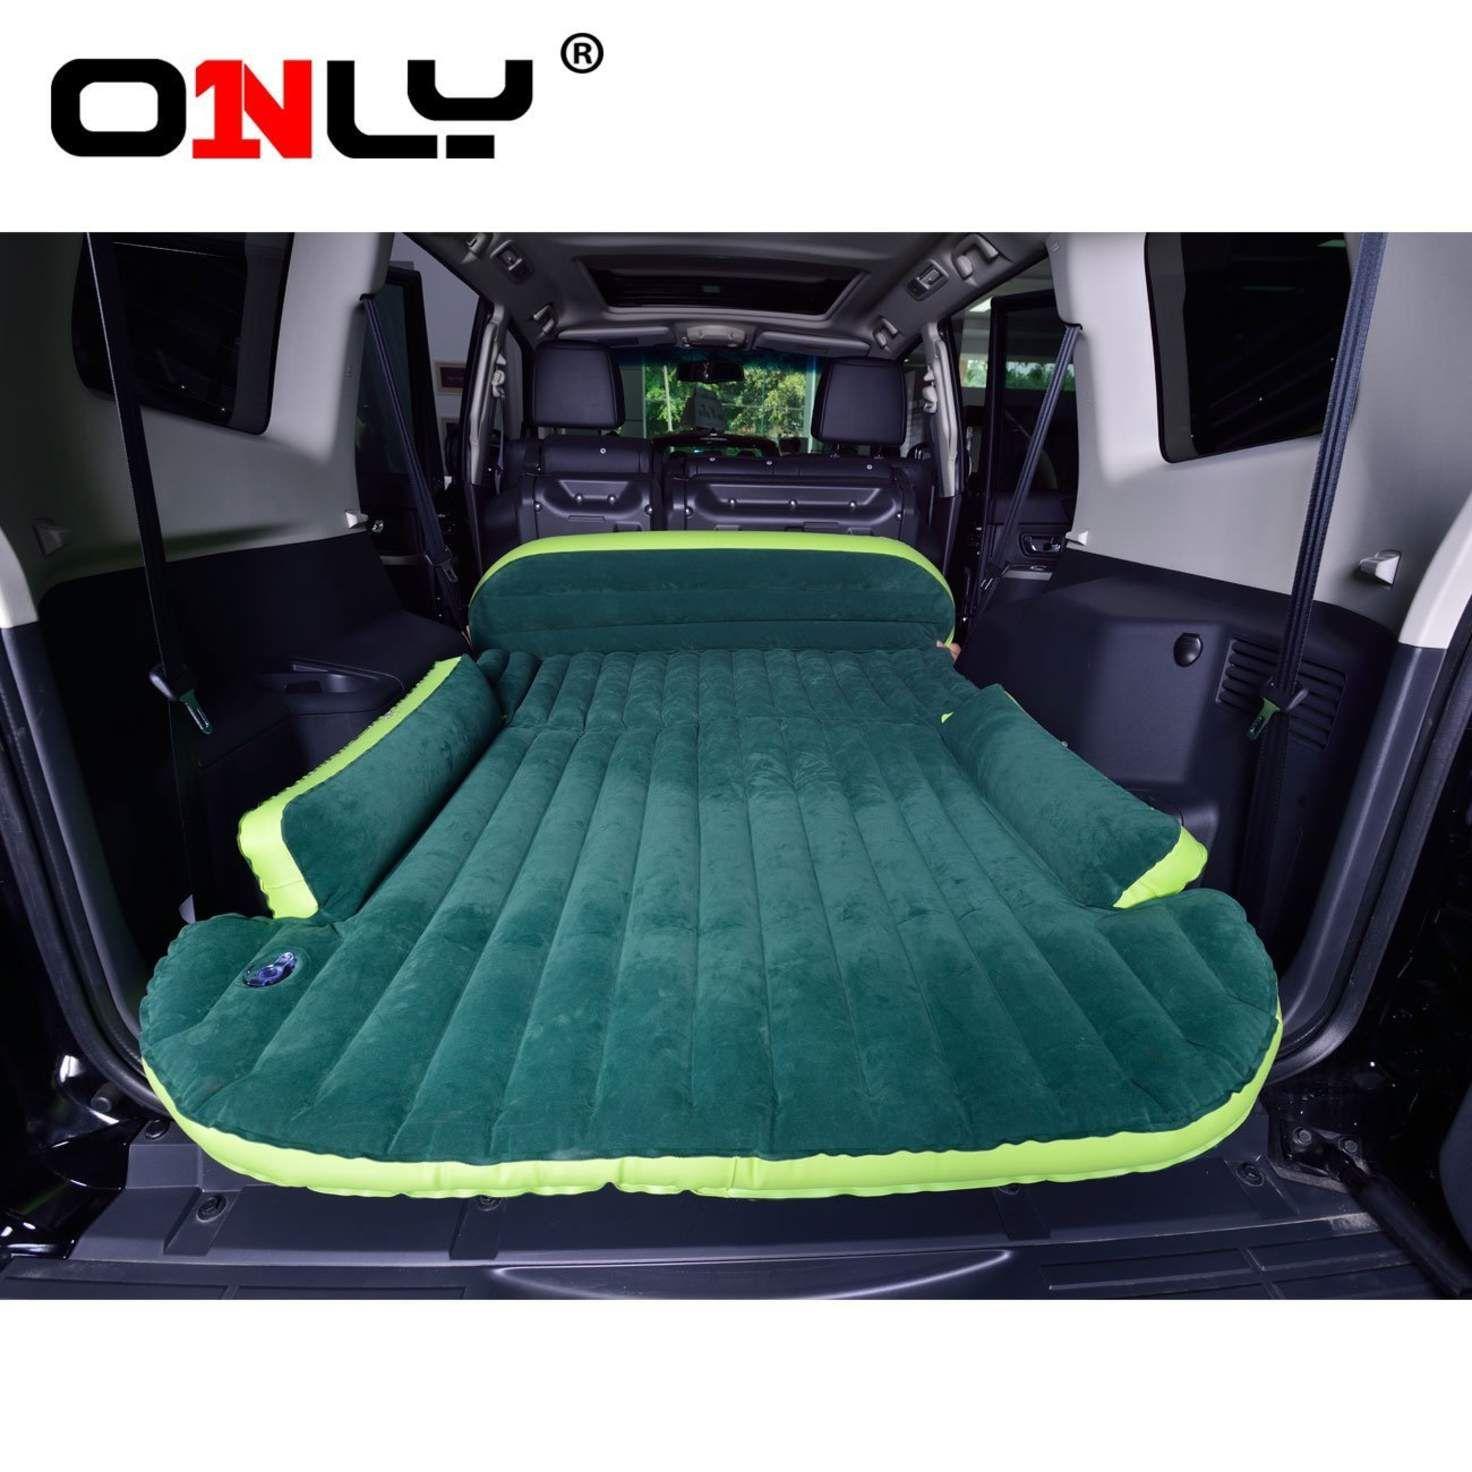 OnlyTM SUV Dedicated Car Mobile Cushion Air Bed Bedroom